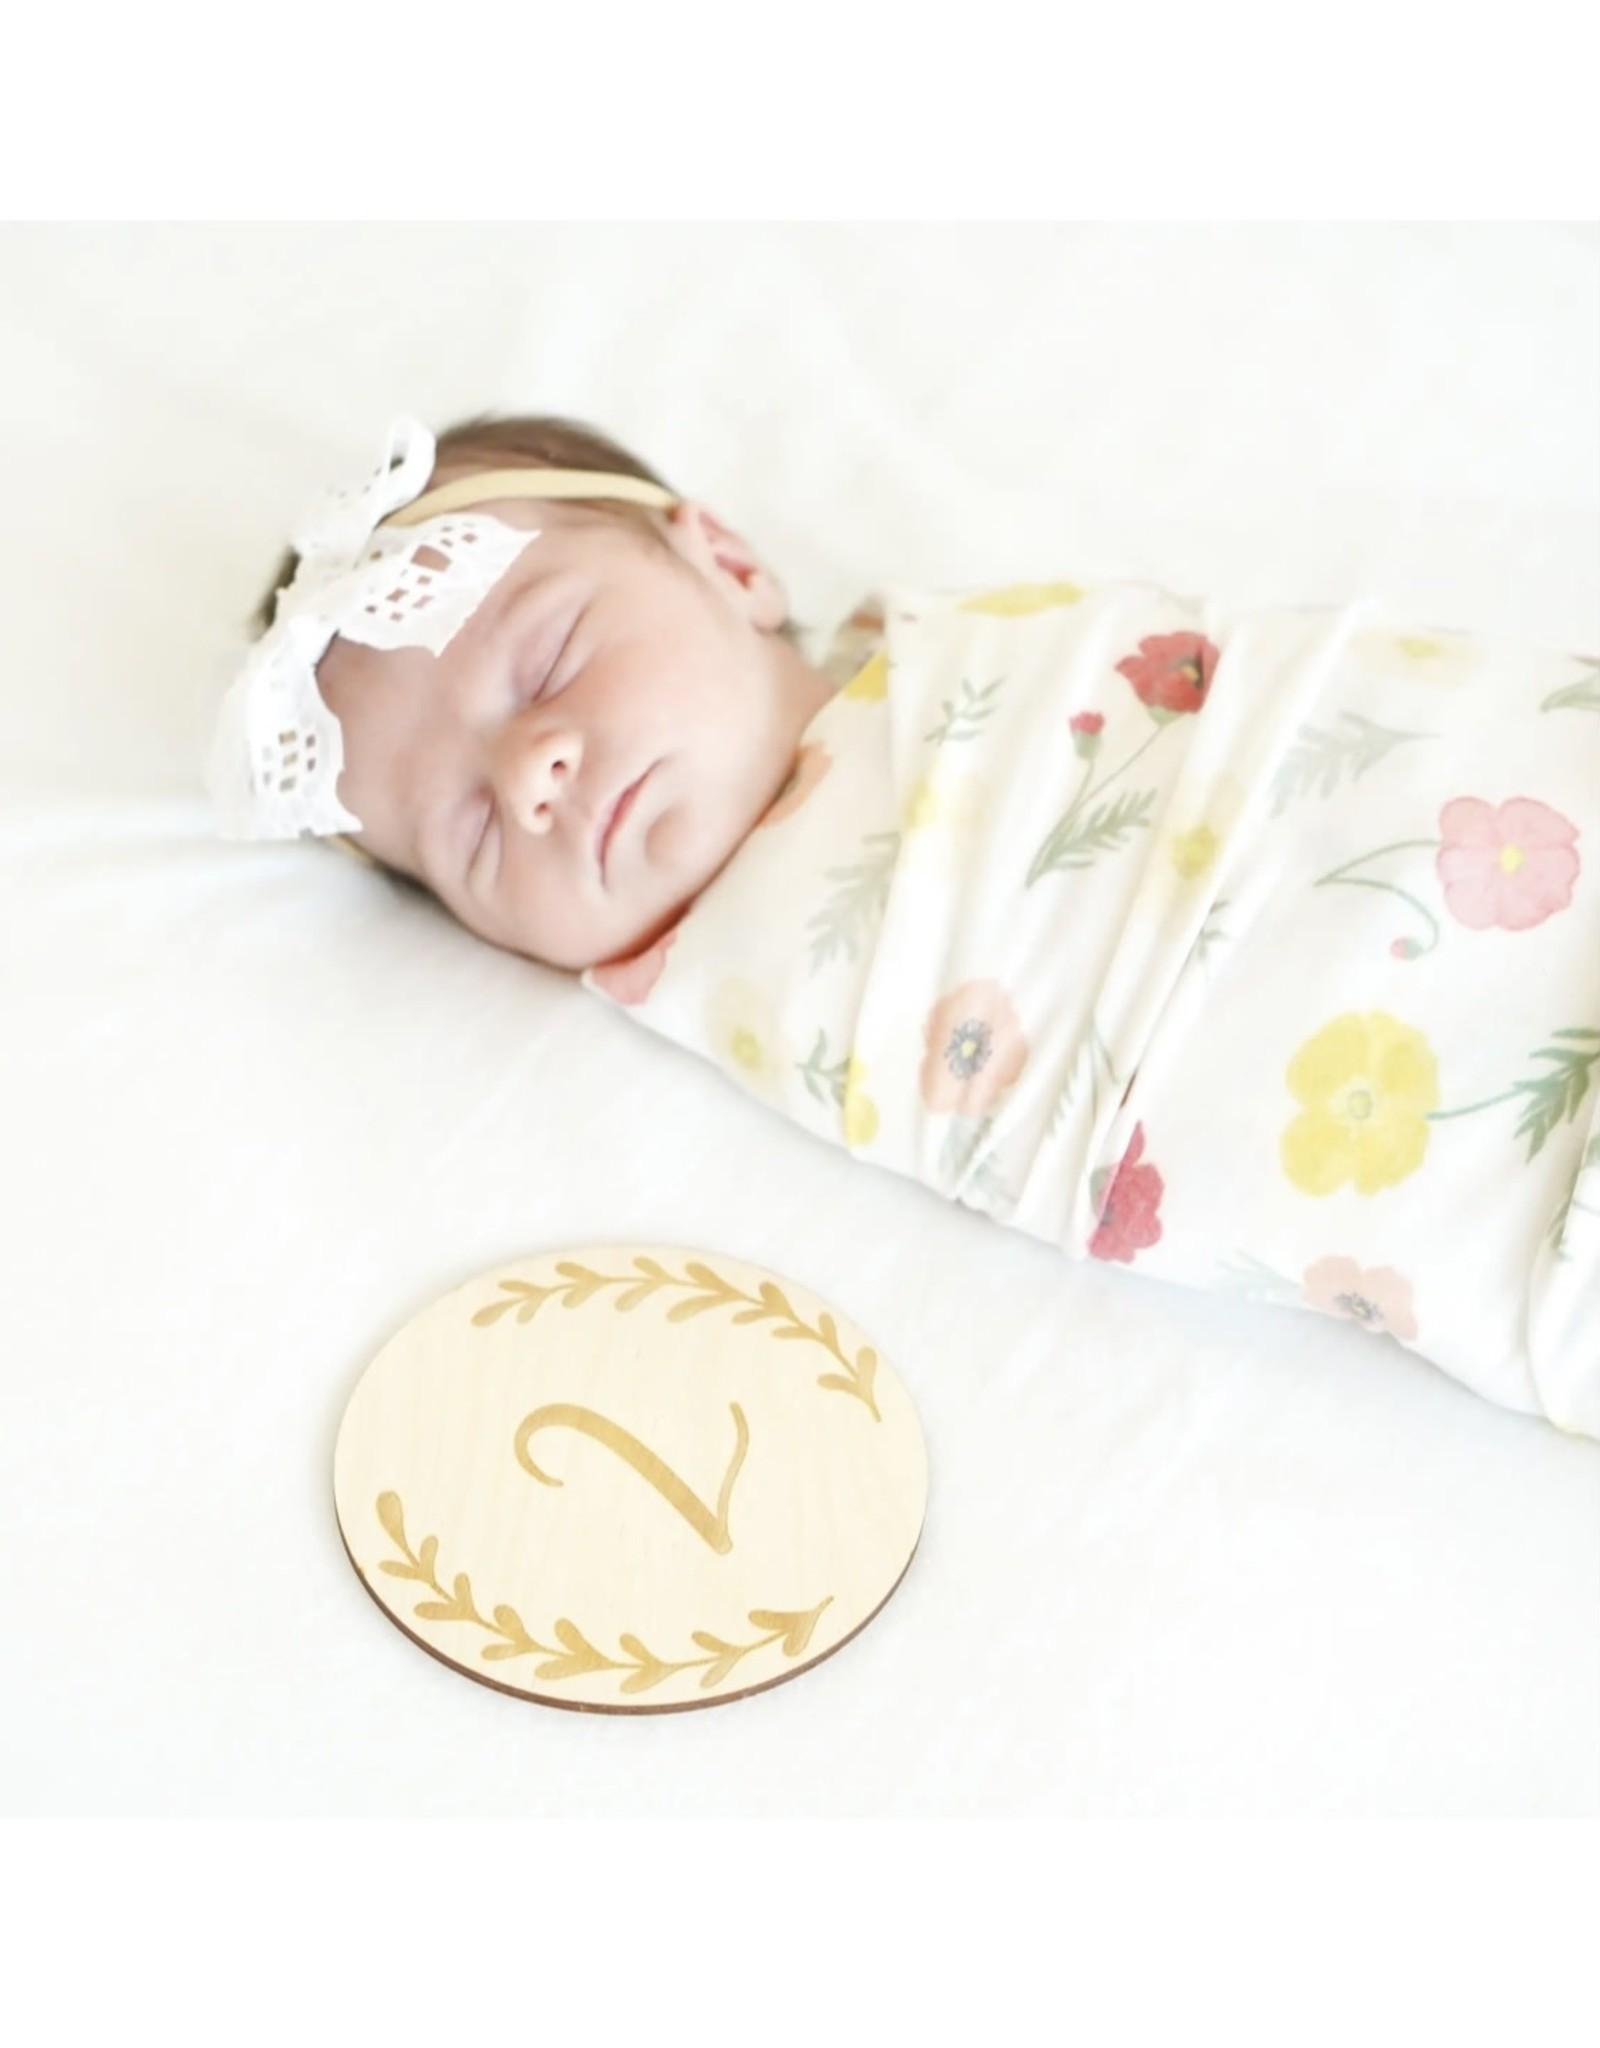 Village Baby Village Baby- Monthly Milestones: Graceful Greenery